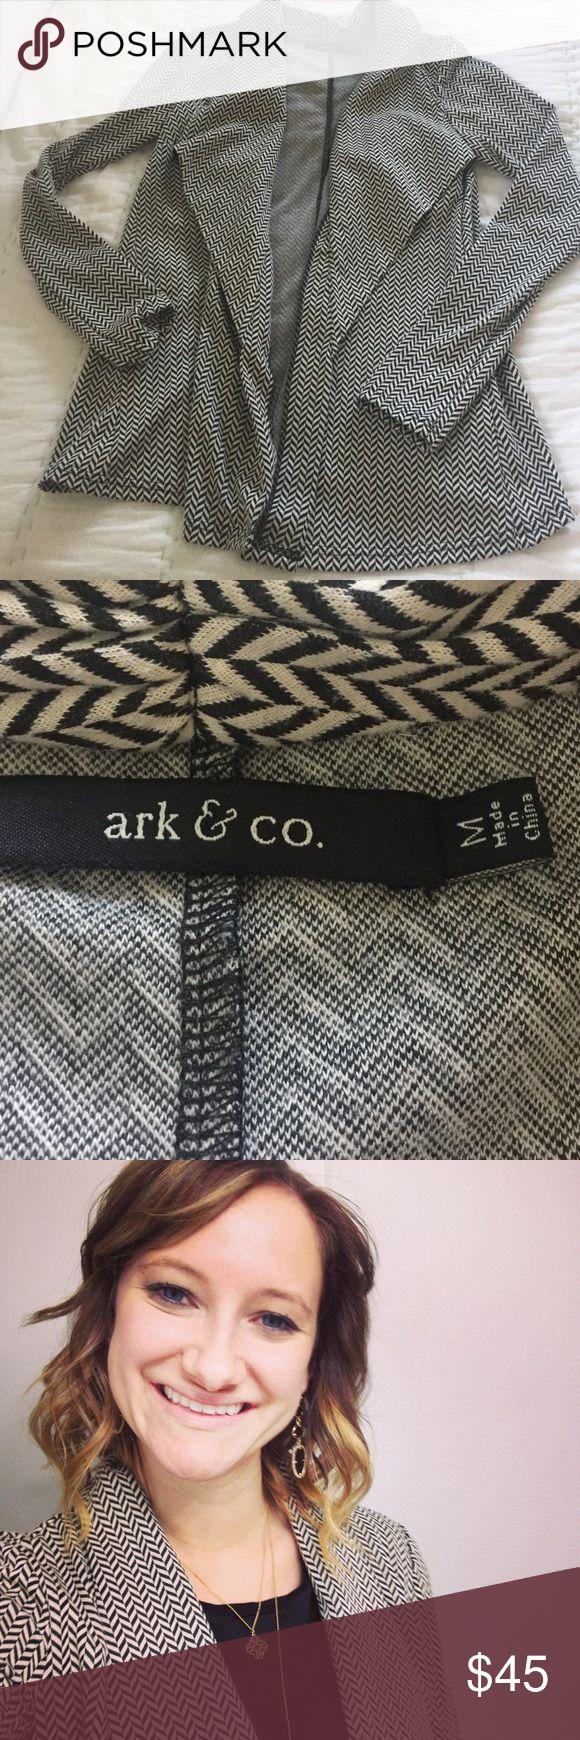 Herringbone Waterfall Blazer Excellent condition tan + black blazer.  Waterfall front so it drapes nicely.  Lightweight. Ark & Co Jackets & Coats Blazers